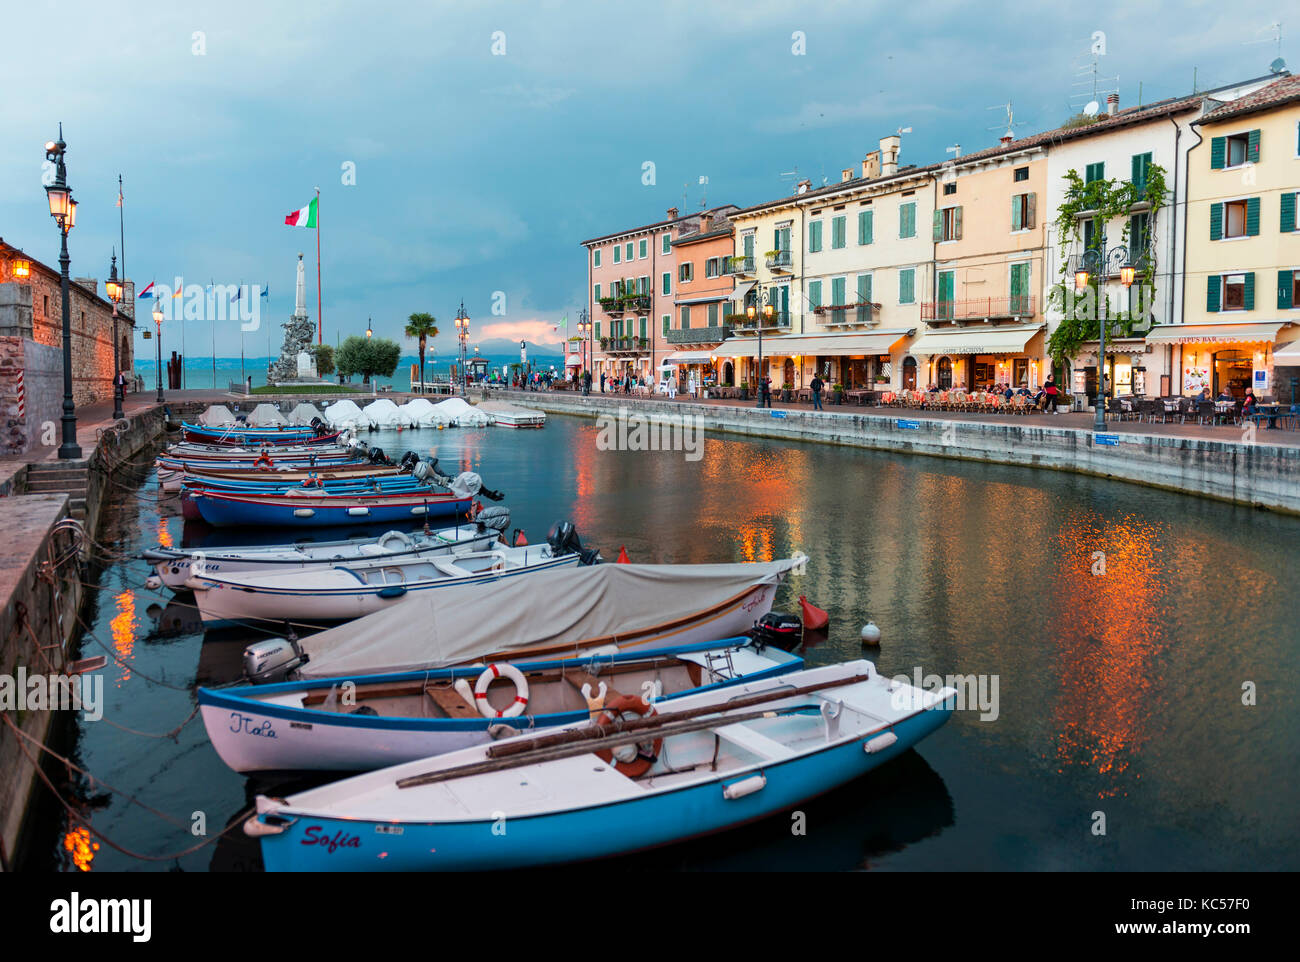 Harbour with fishing boats, Lazise, Lake Garda, Veneto, Veneto, Veneto, Italy Stock Photo